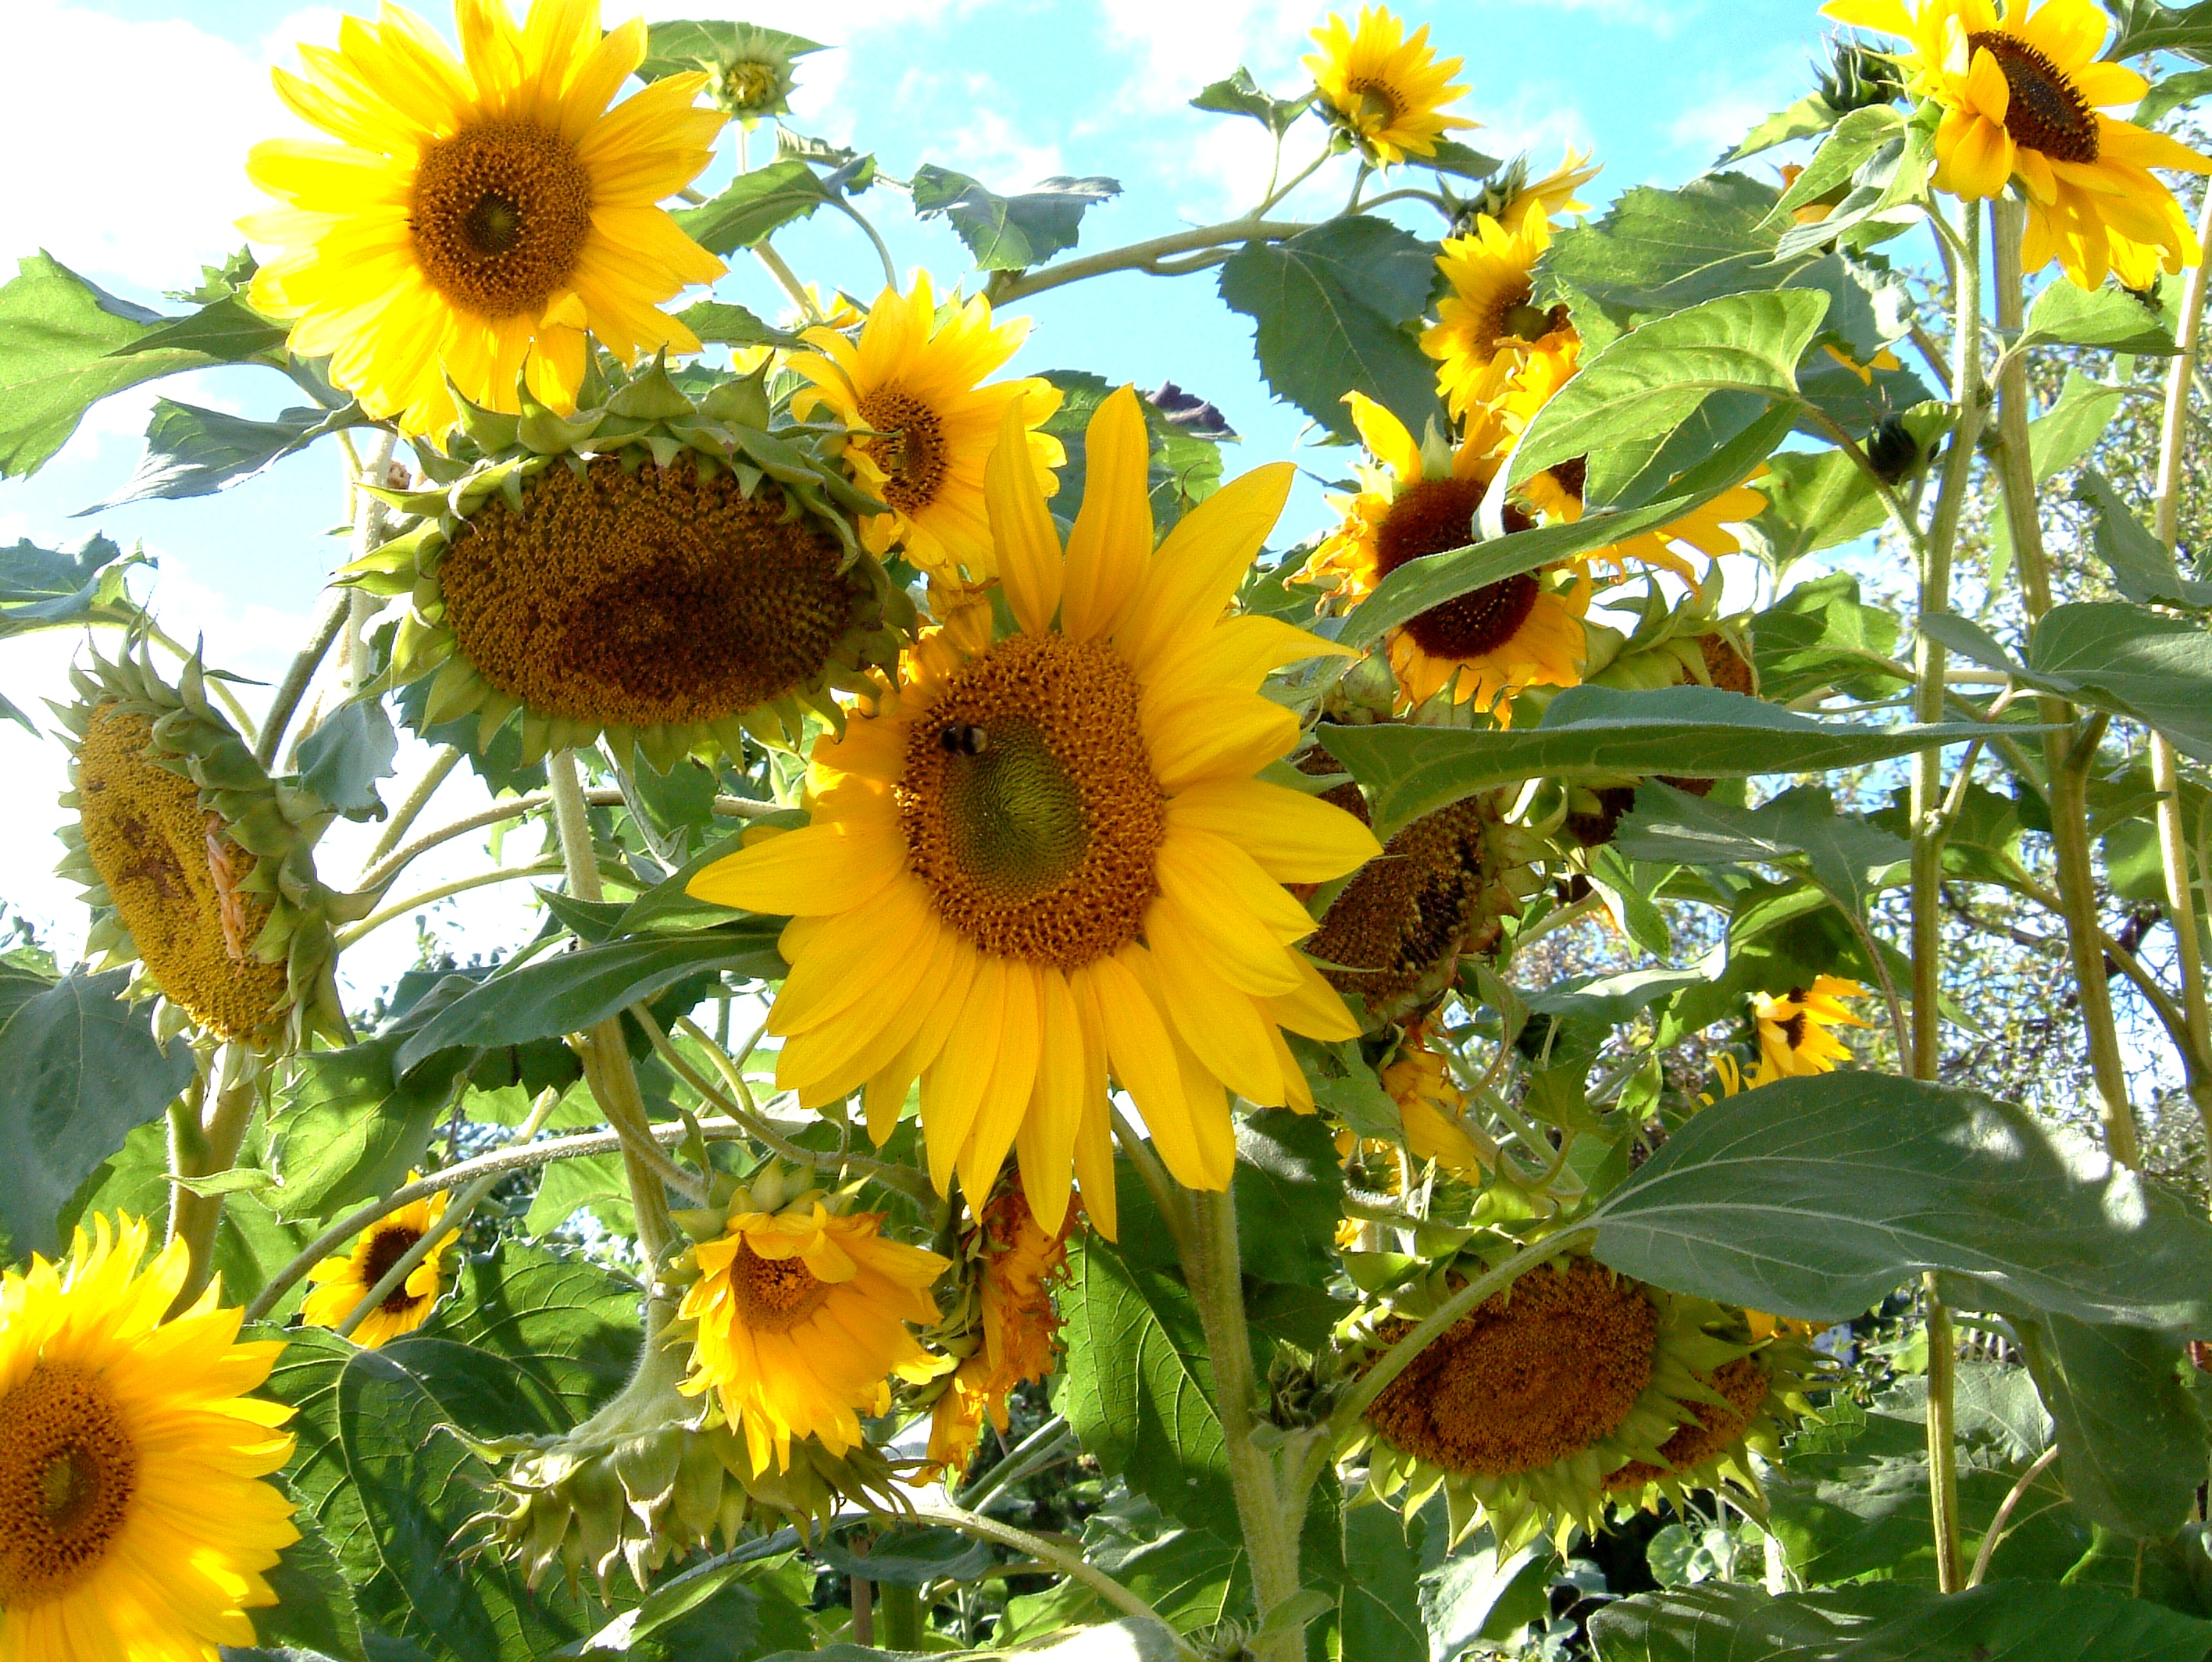 How Do Sunflowers Reproduce